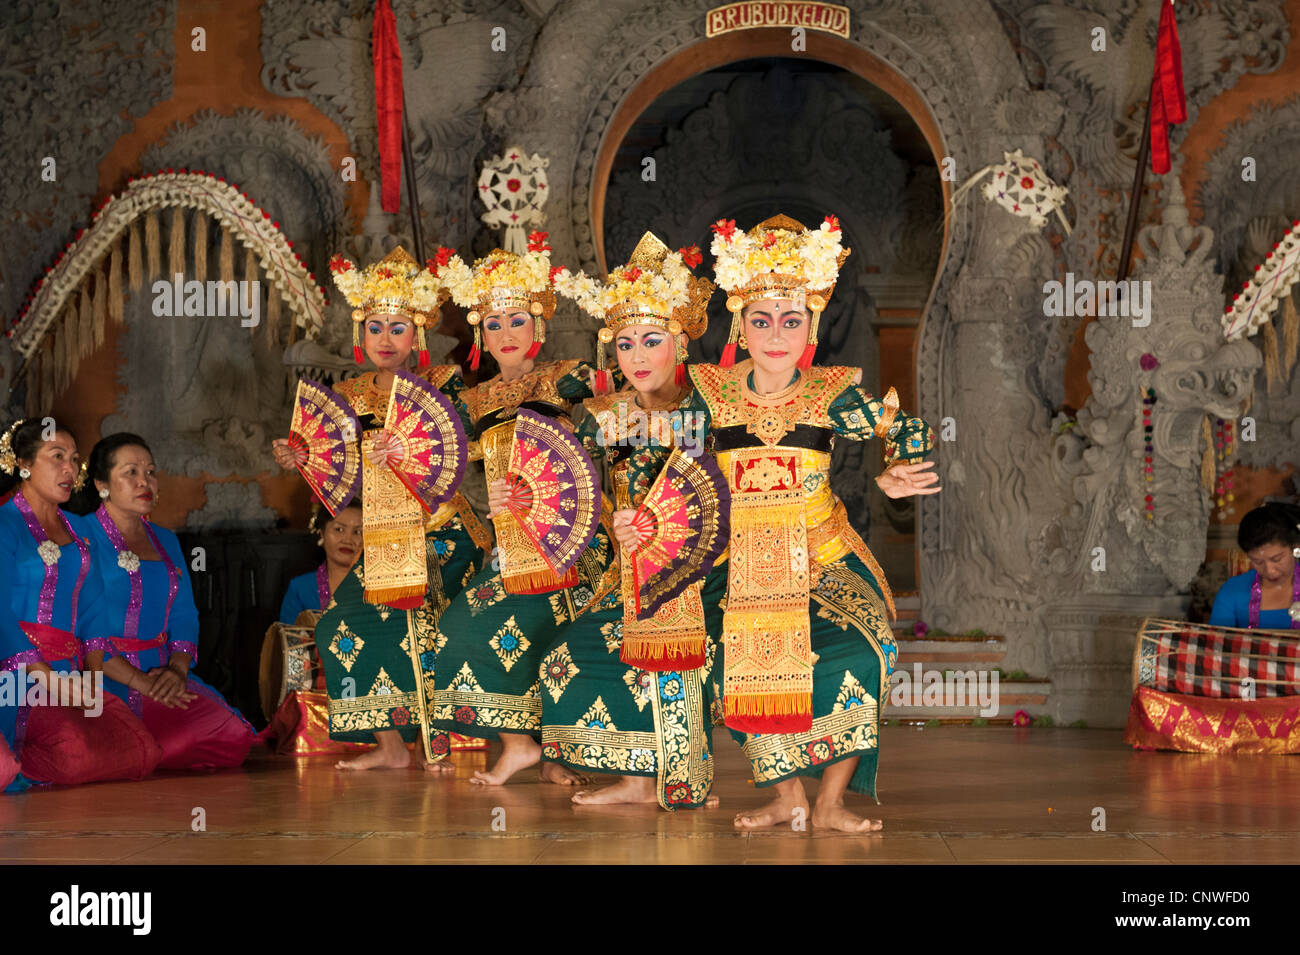 Balinese dancers performing a sort of legong dance in Ubud, Bali, Indonesia - Stock Image